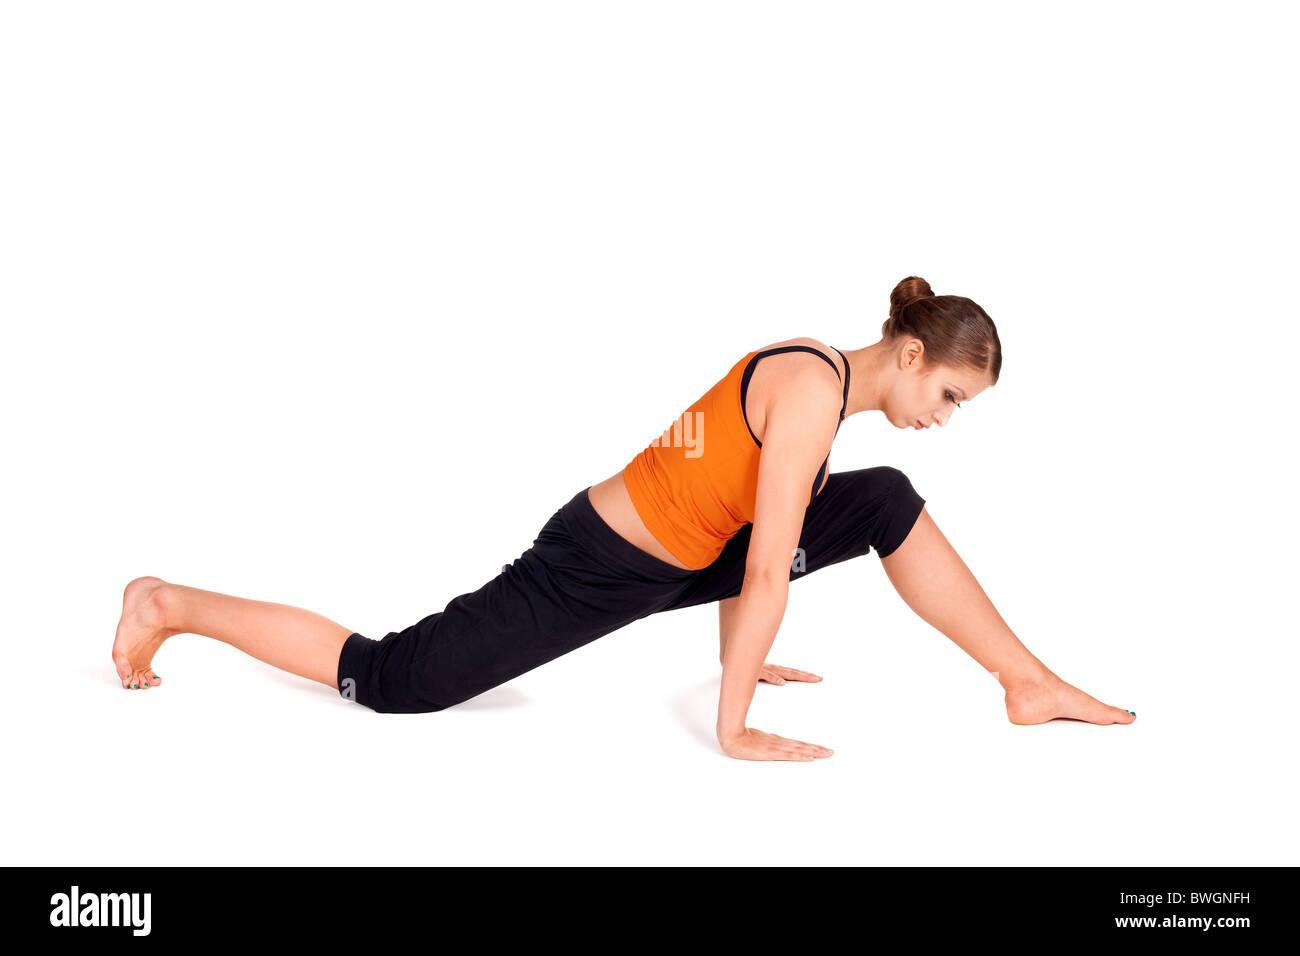 Woman Doing Preparation Exercise For Monkey God Pose Yoga Posture Sanskrit Name Hanumanasana